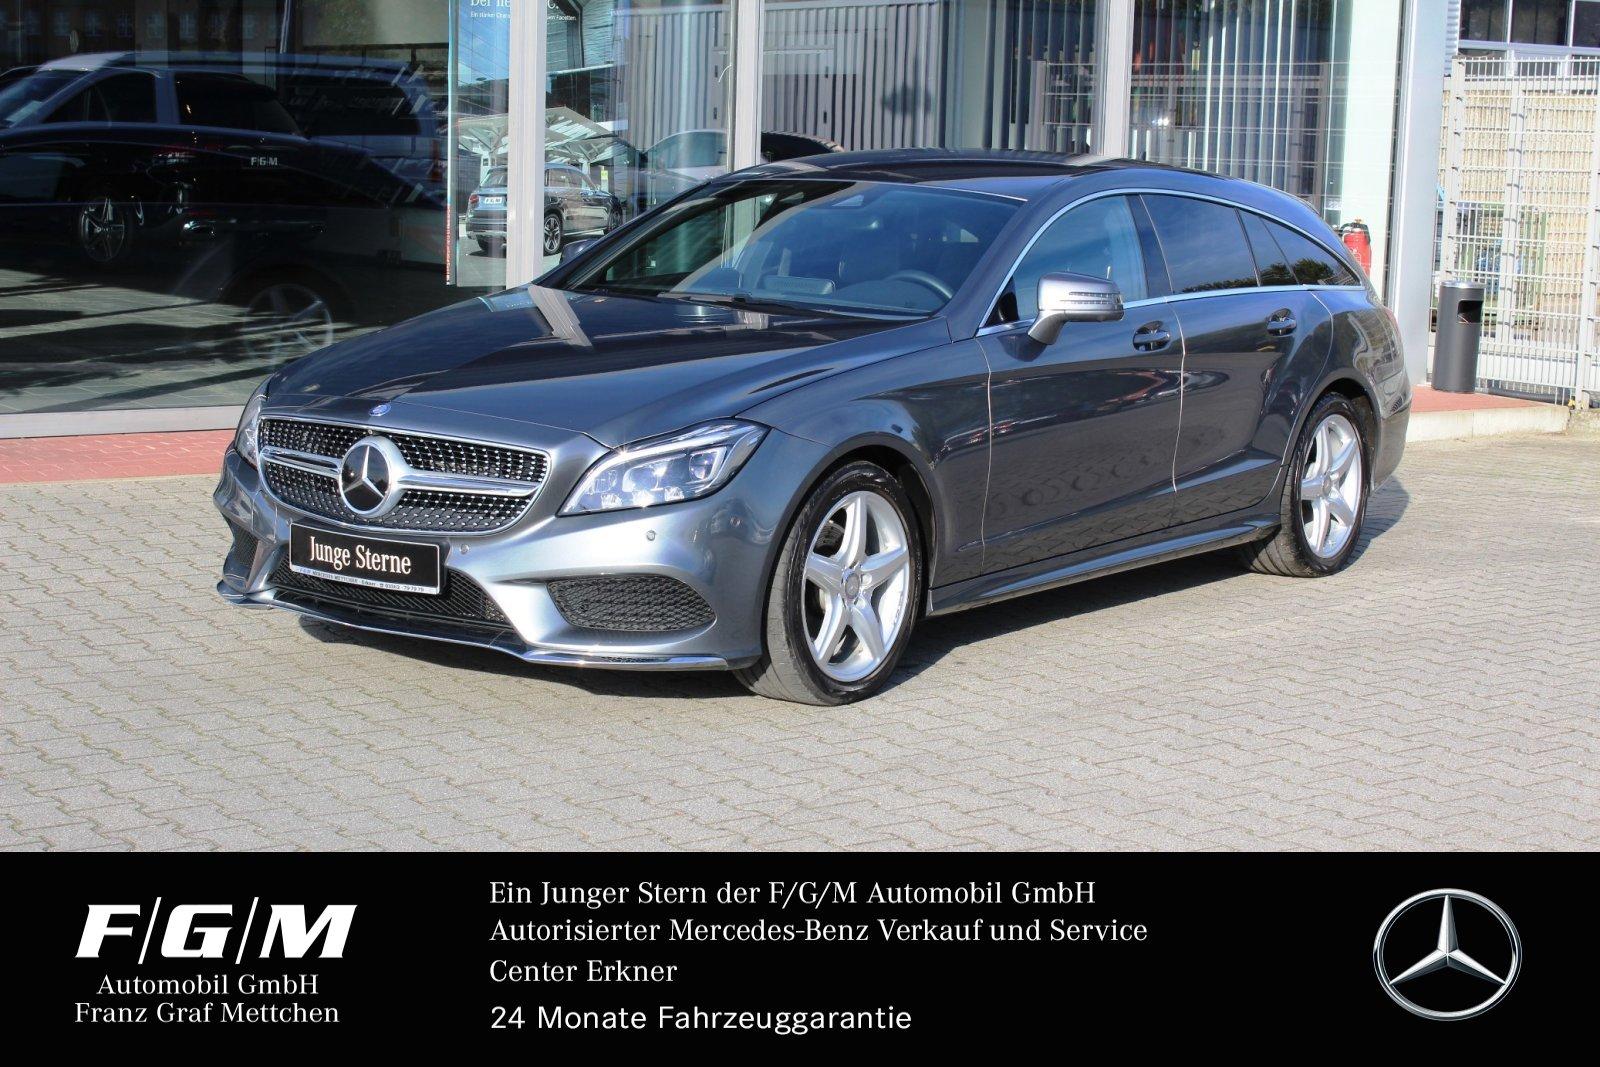 Mercedes-Benz CLS 250 d 4M SB AMG/Com/Distr+/Standheizung/Memo, Jahr 2015, Diesel